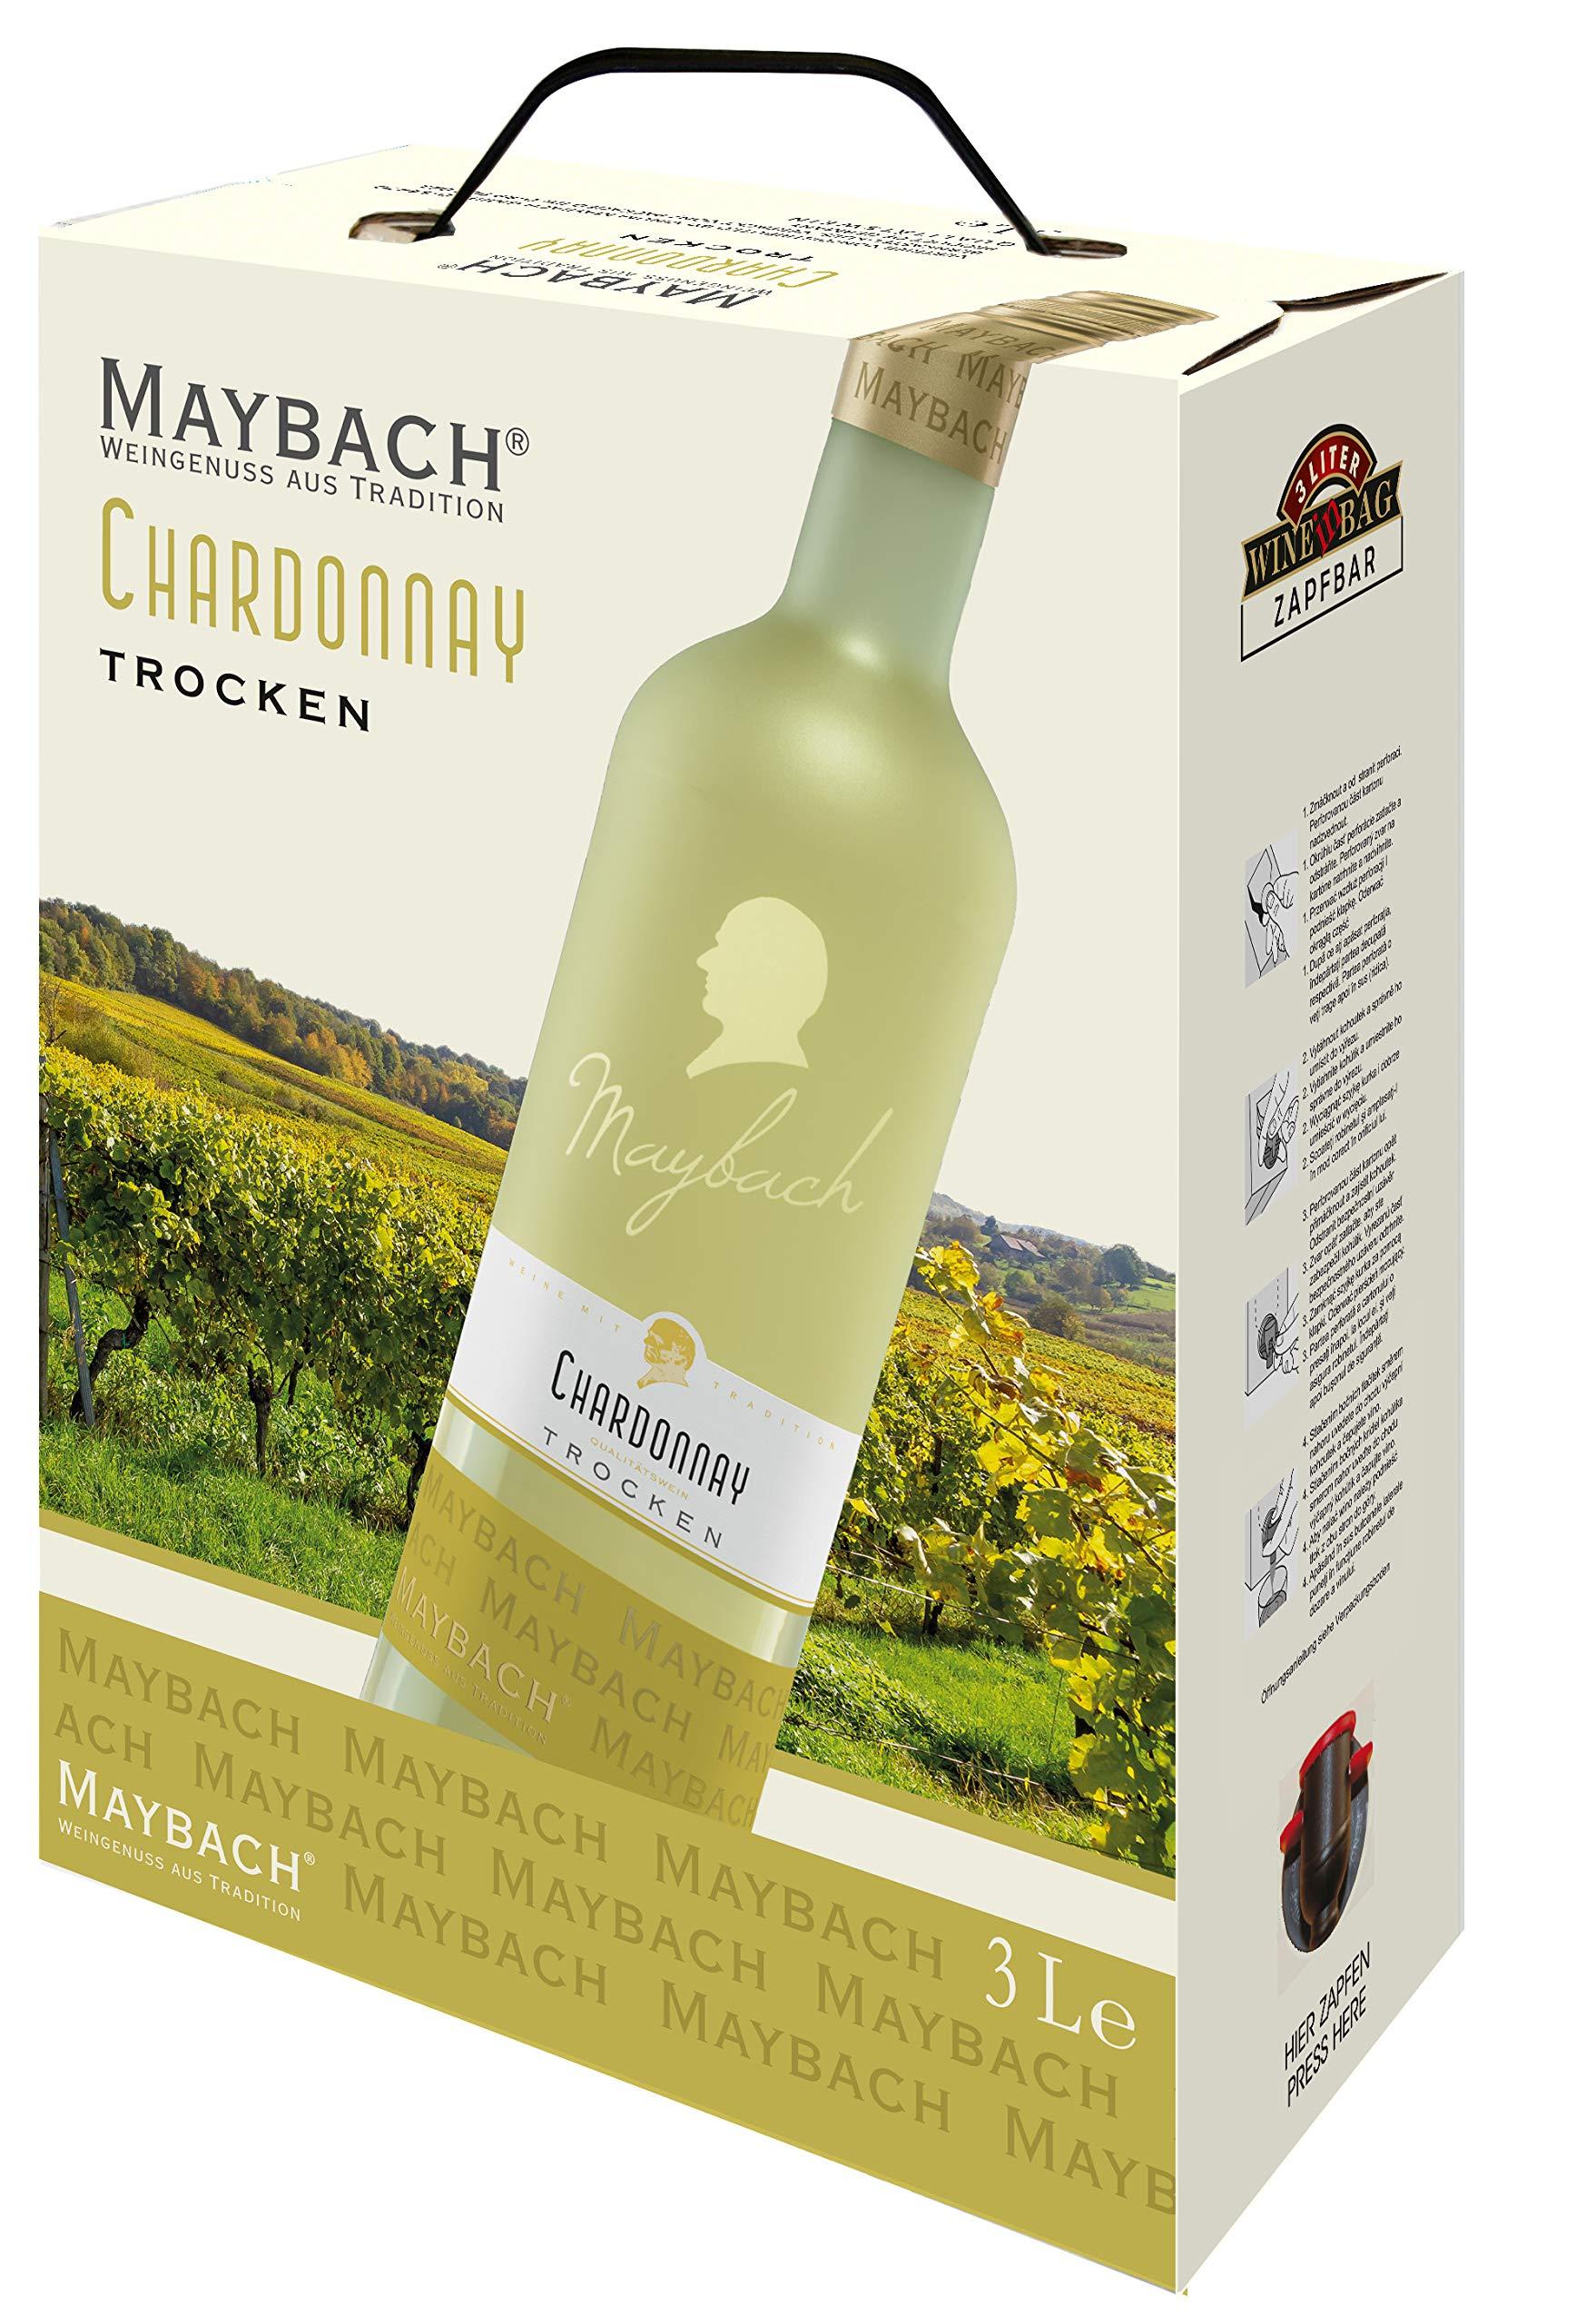 maybach chardonnay trocken (1 x 3 l) bag-in-box | alles über wein